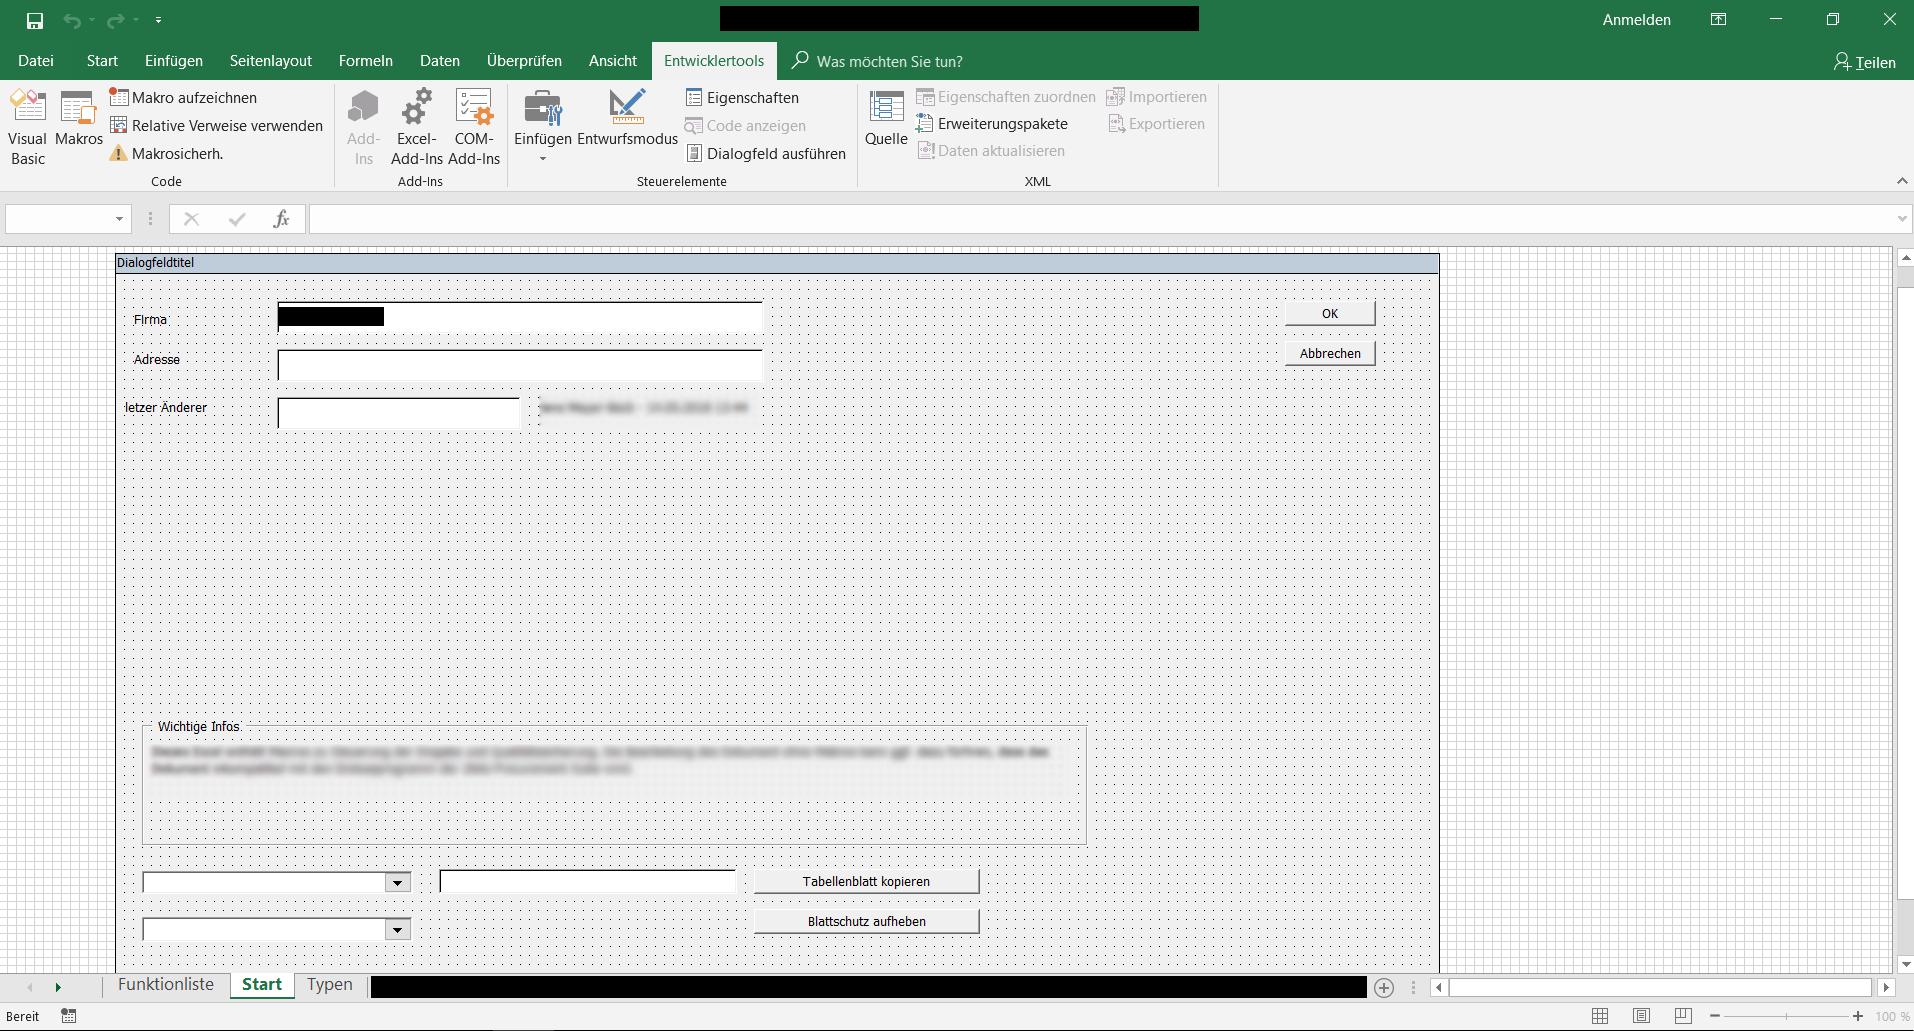 Excel Vba Spreadsheet In Userform Spreadsheet Downloa Excel Vba Sheet In Userform Excel Vba